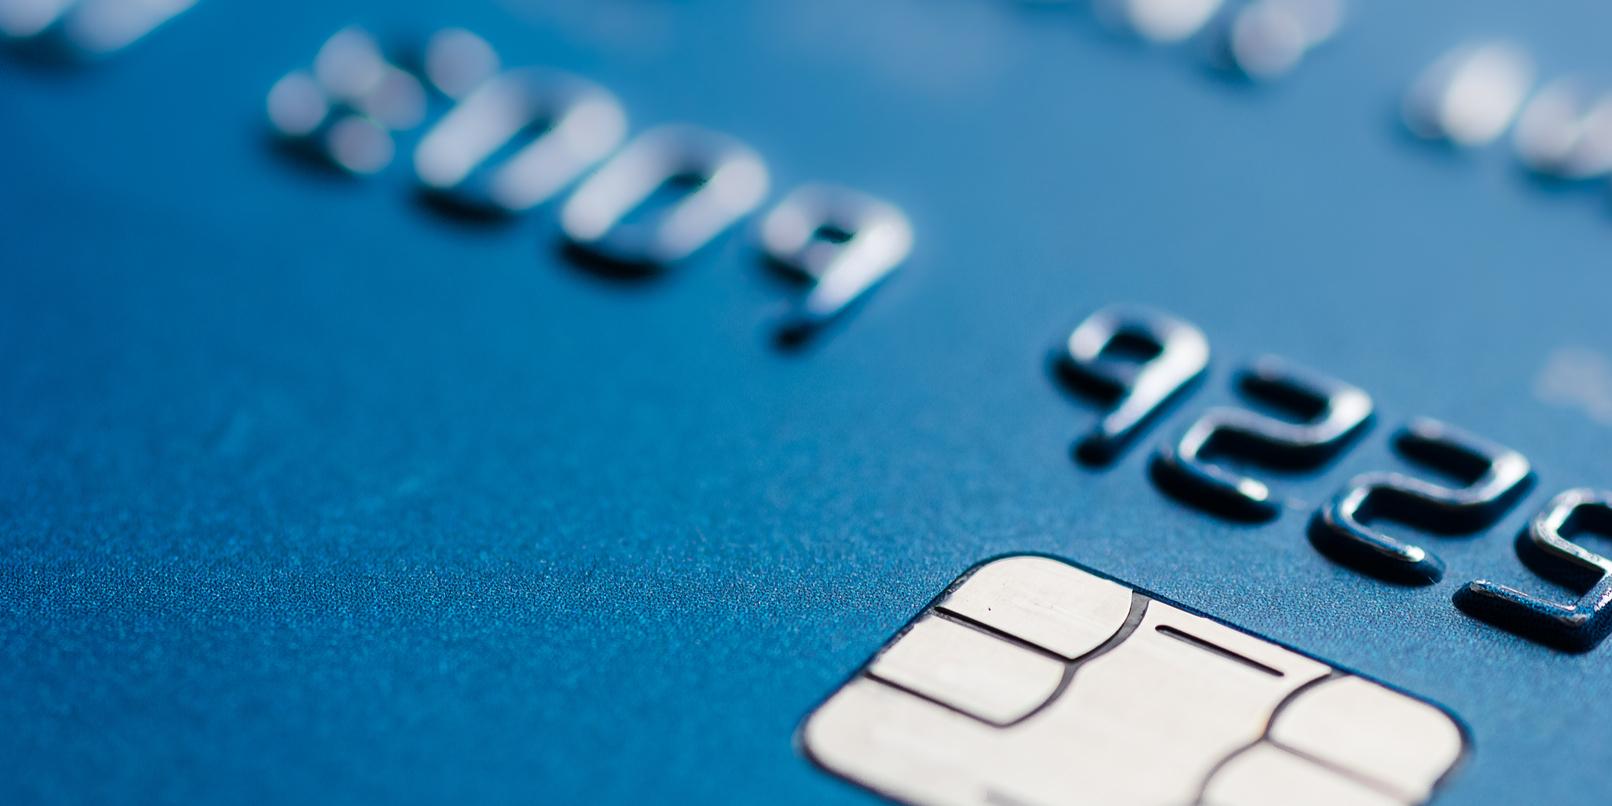 Hackers steal 3.2 million debit card details in India